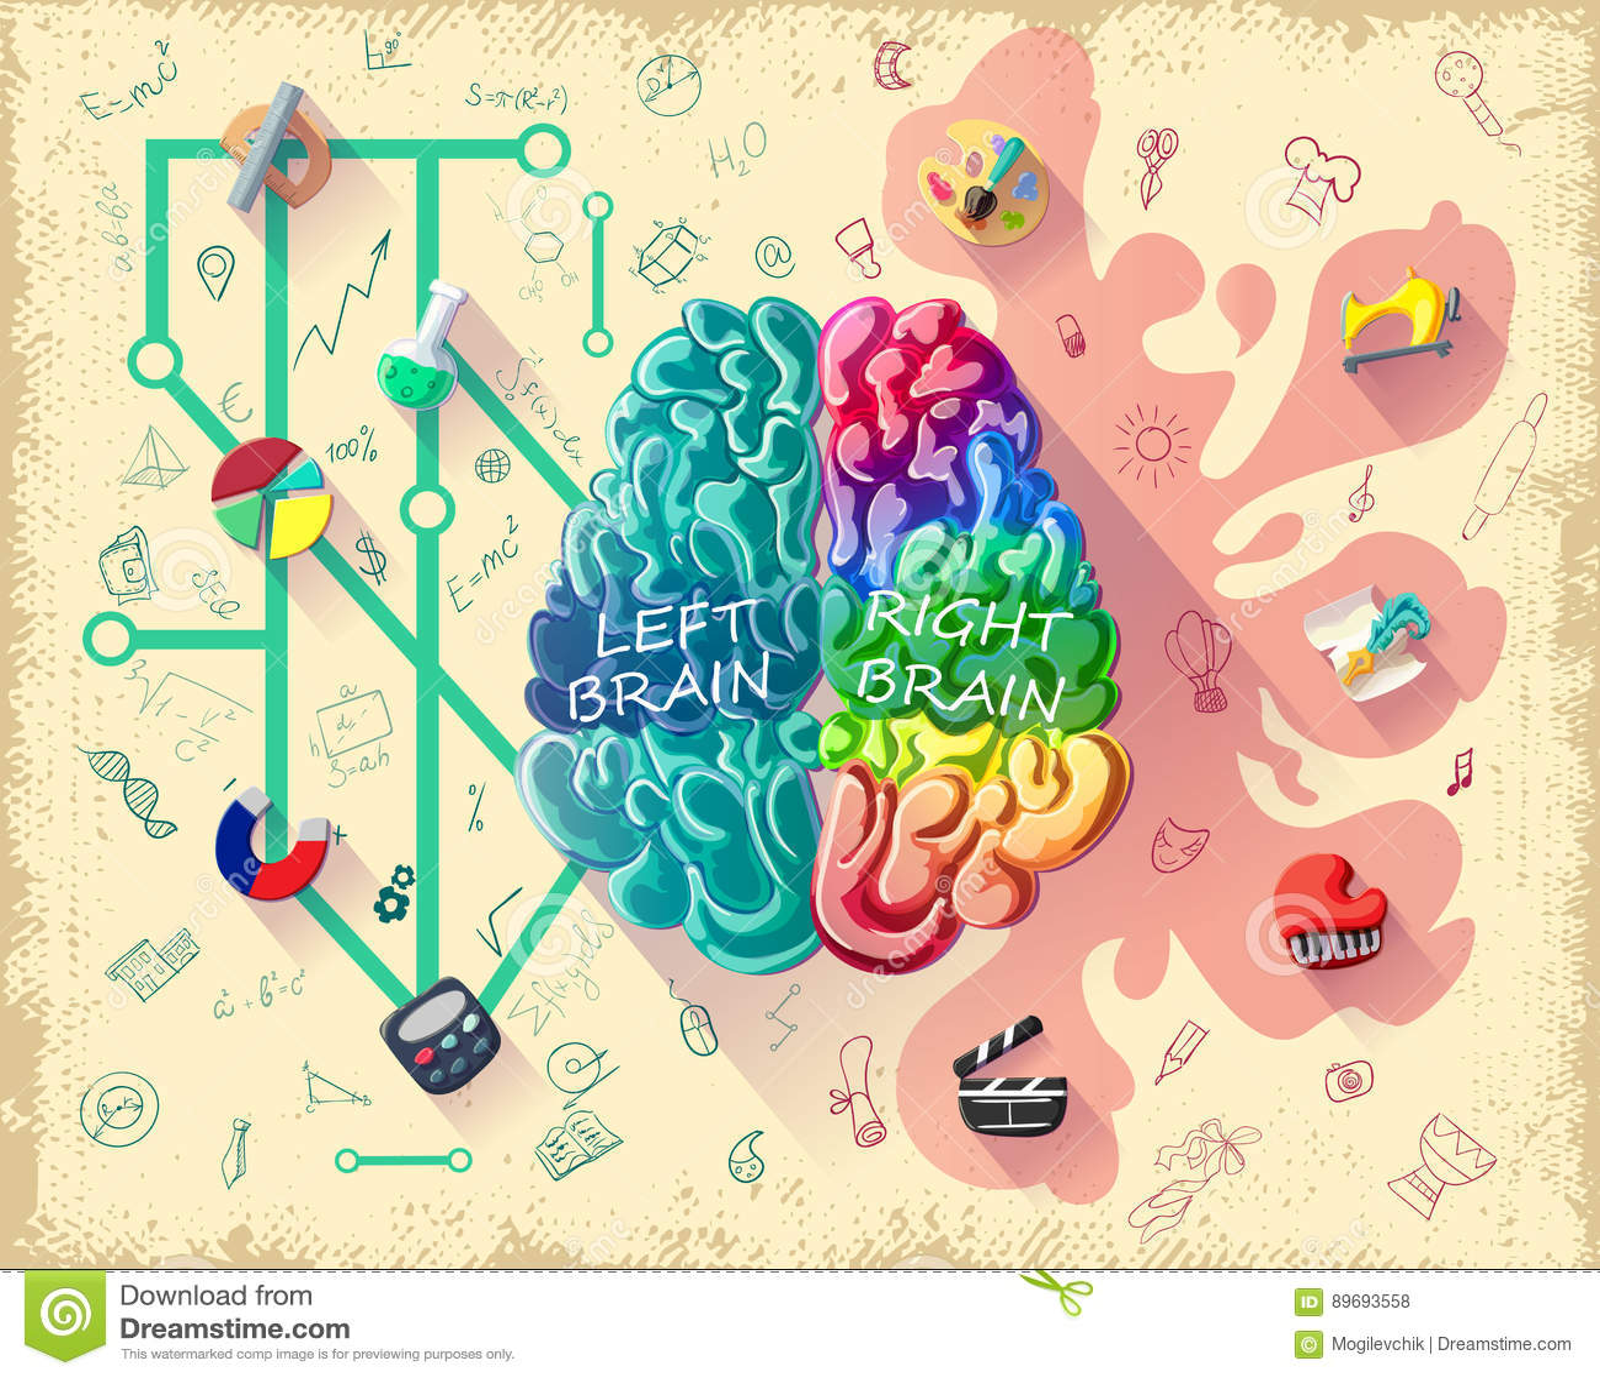 Cartoon Human Brain Diagram Concept Stock Vector - Illustration of ...